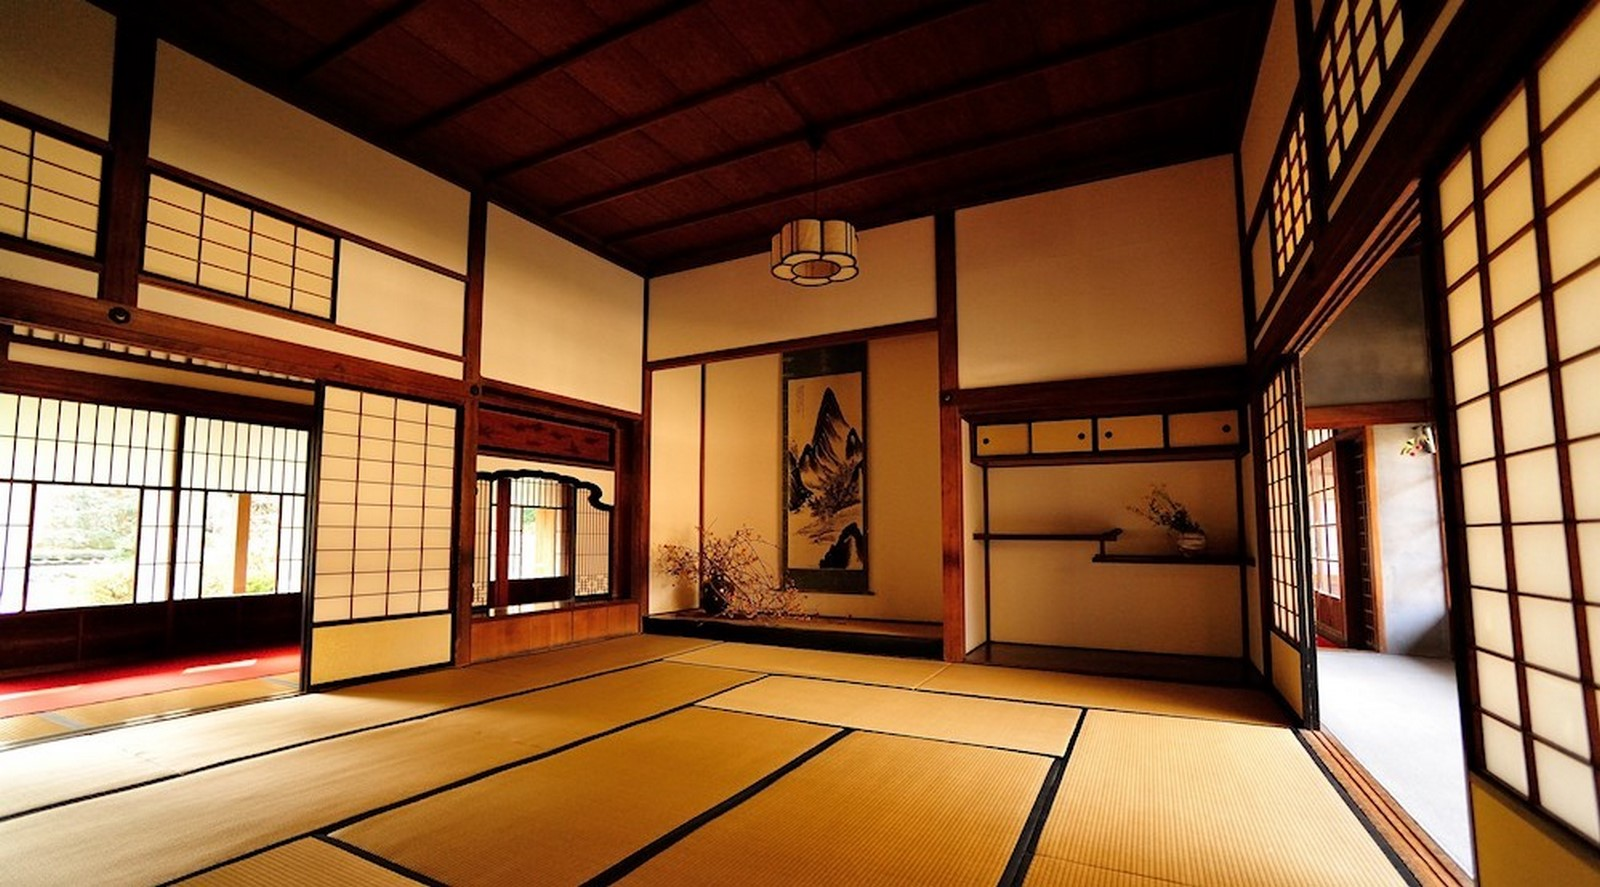 Shoin-zukuri Architecture: Japanese residential architecture - Sheet3